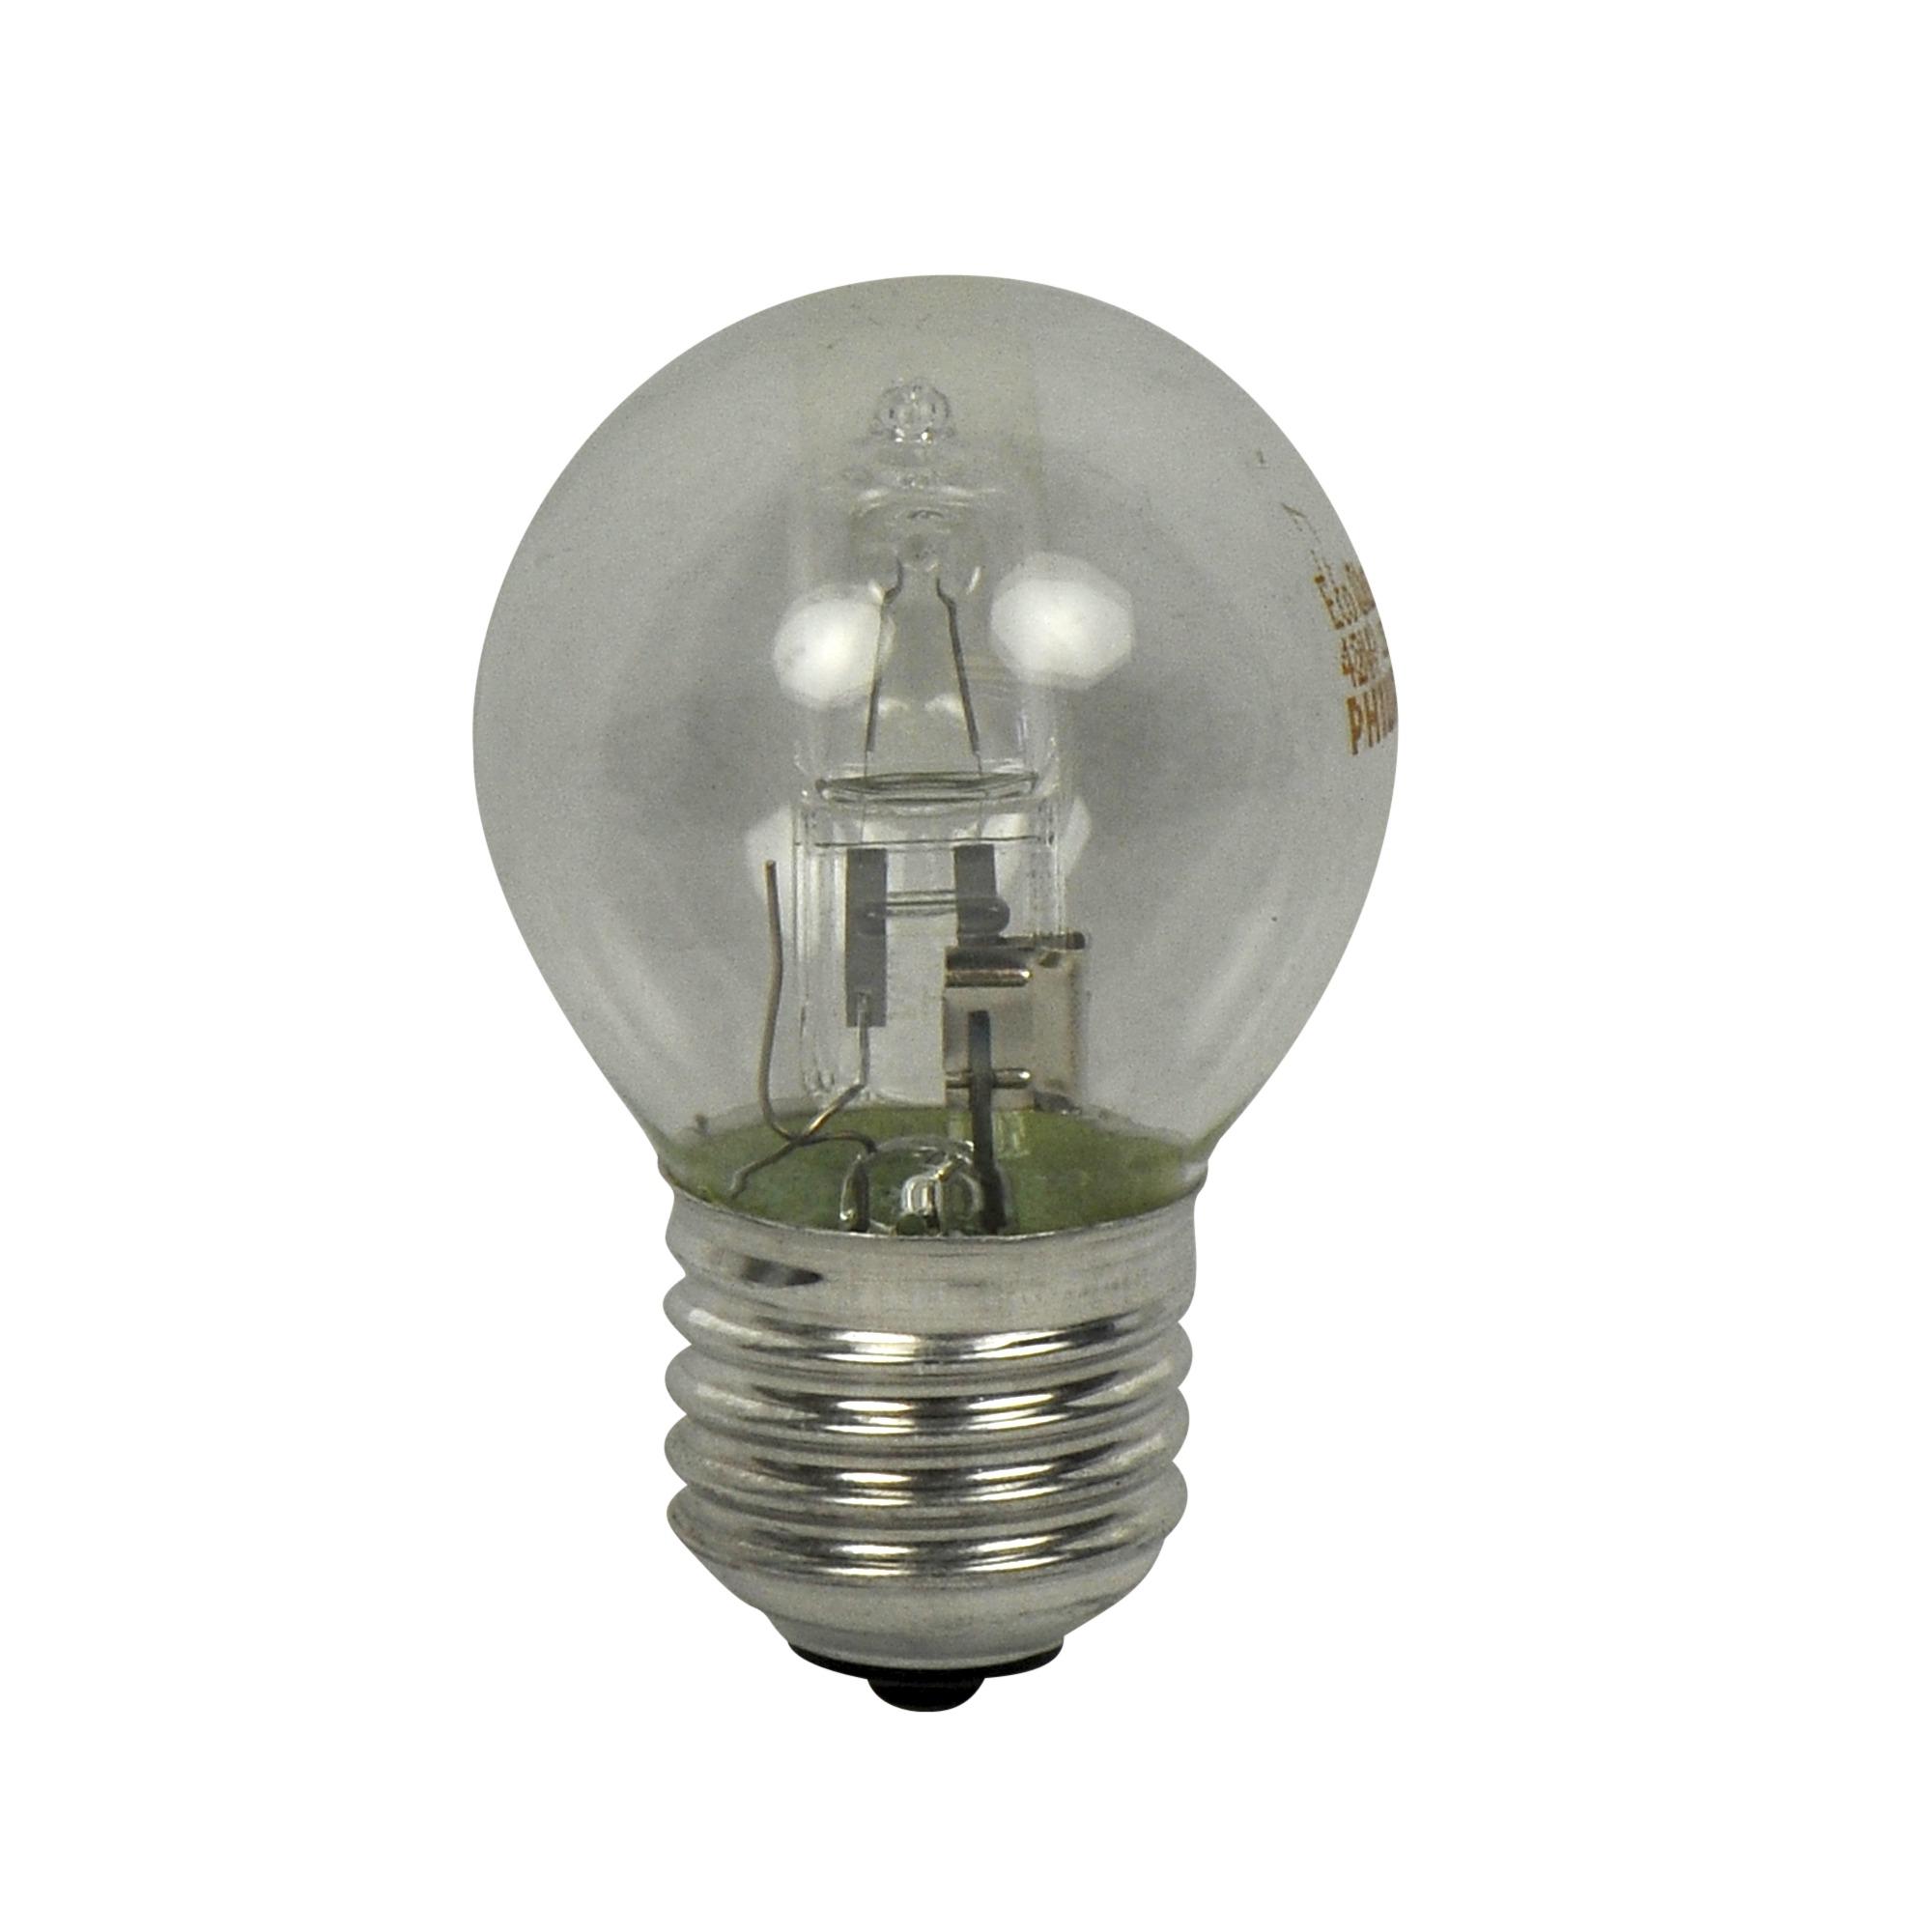 philips ecoclassic halogeenlamp kogel helder e27 42w alle lampen lampen verlichting karwei. Black Bedroom Furniture Sets. Home Design Ideas